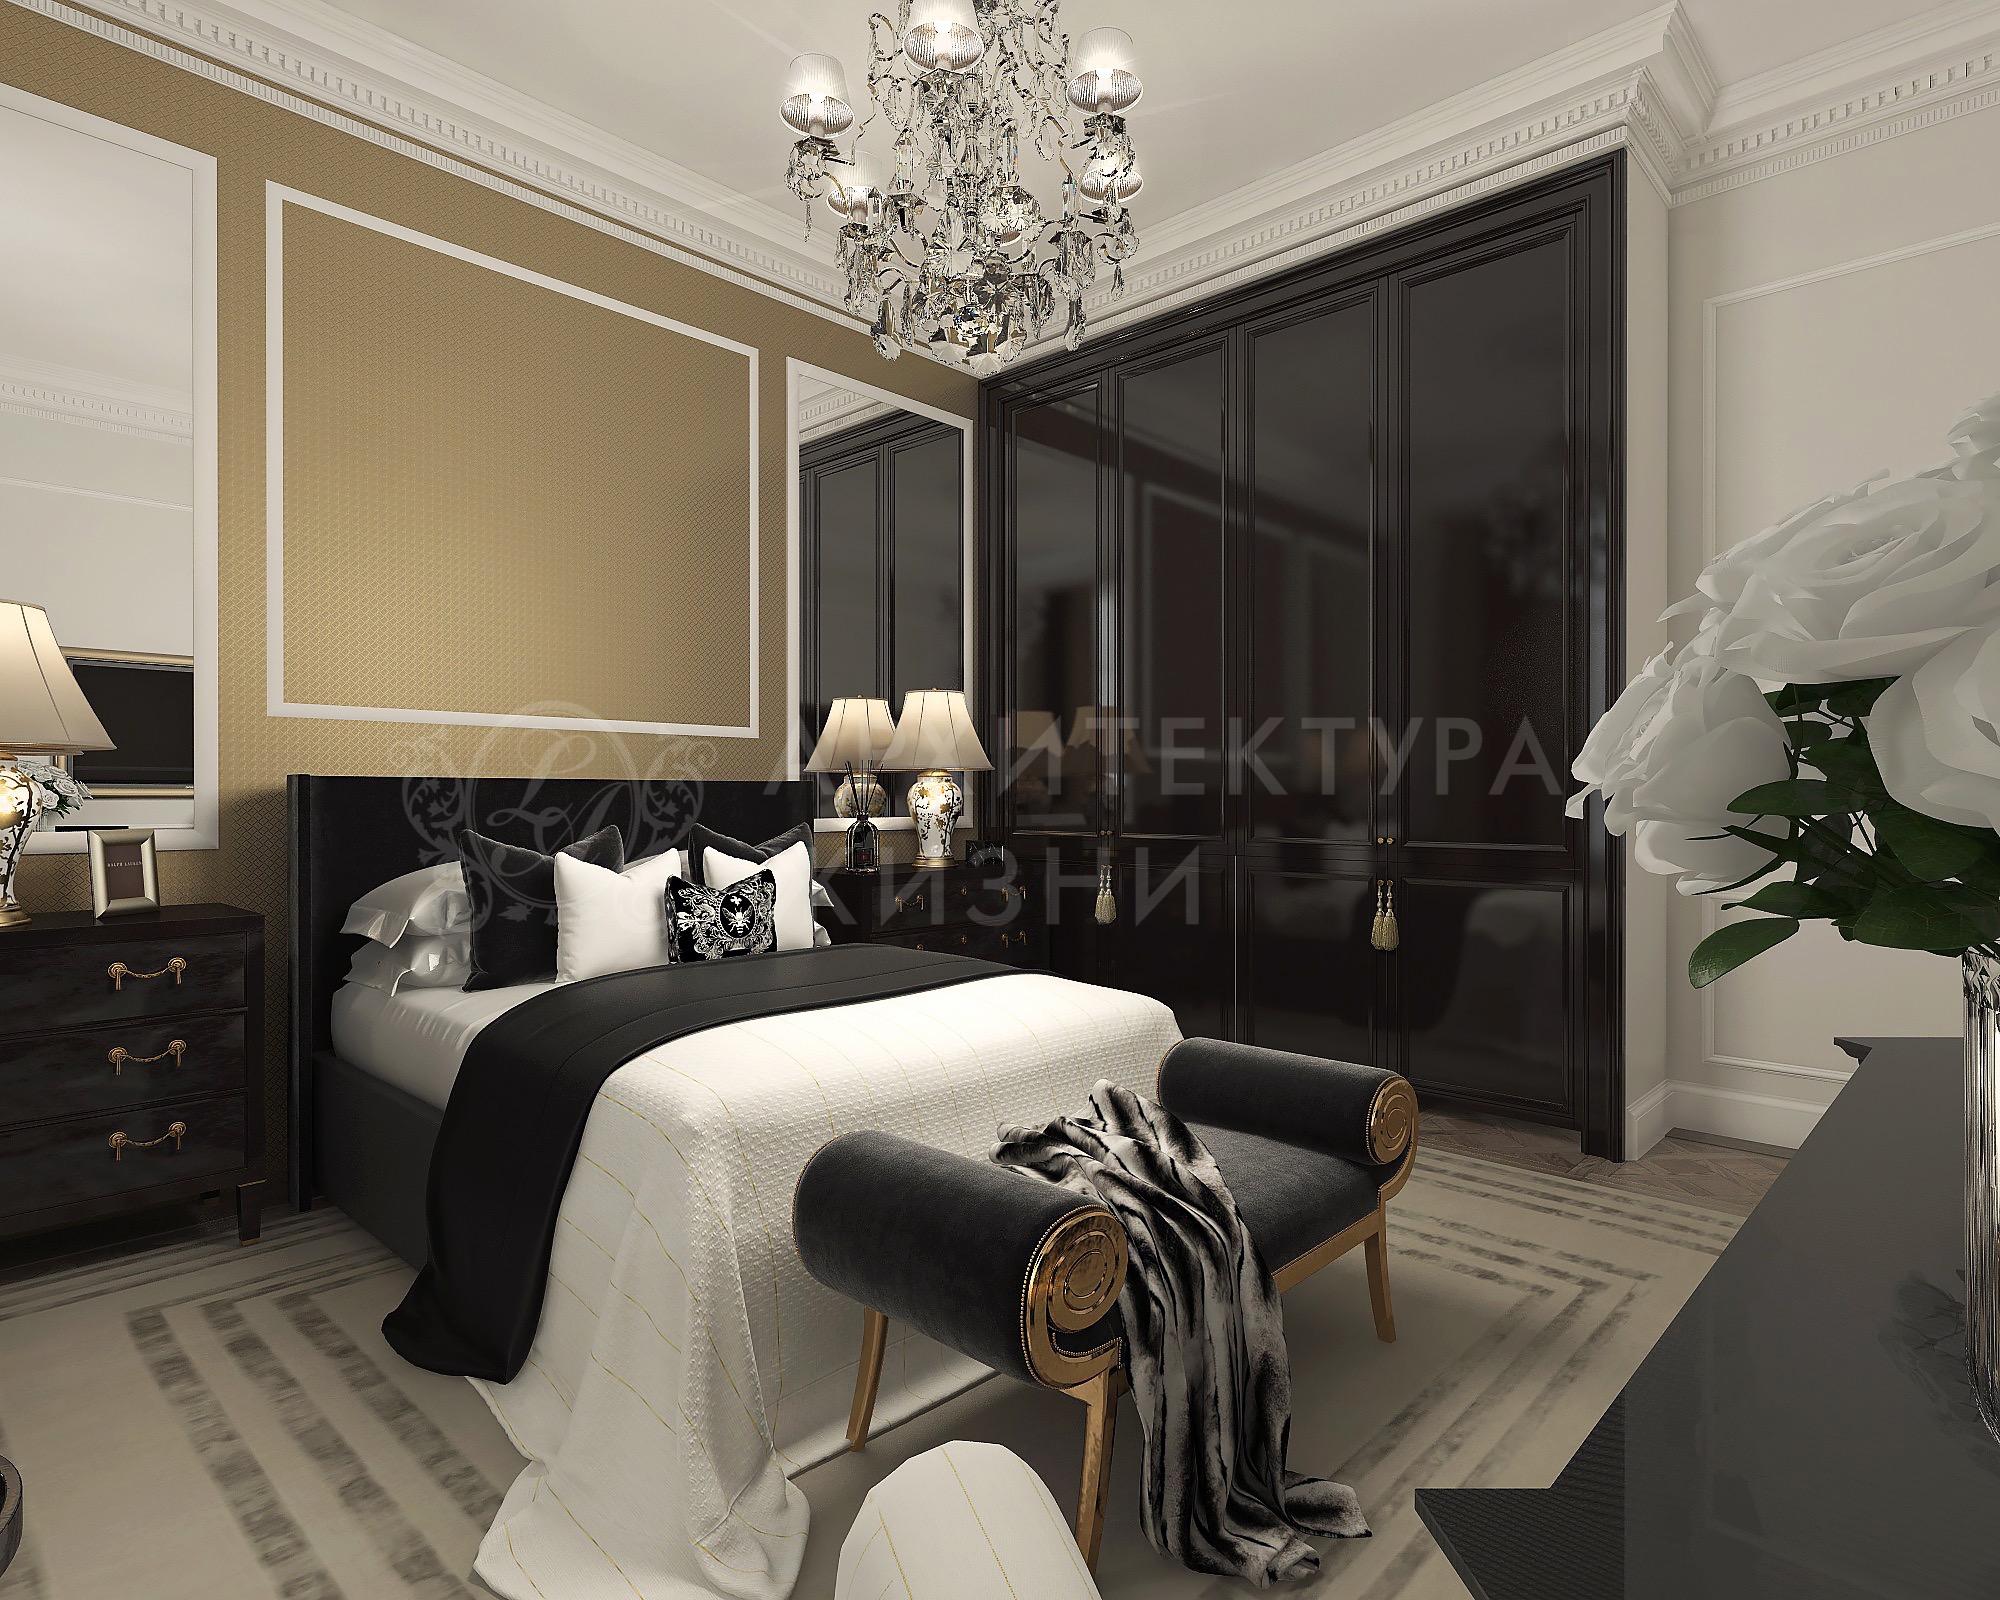 гостевая спальня 2 1.jpg